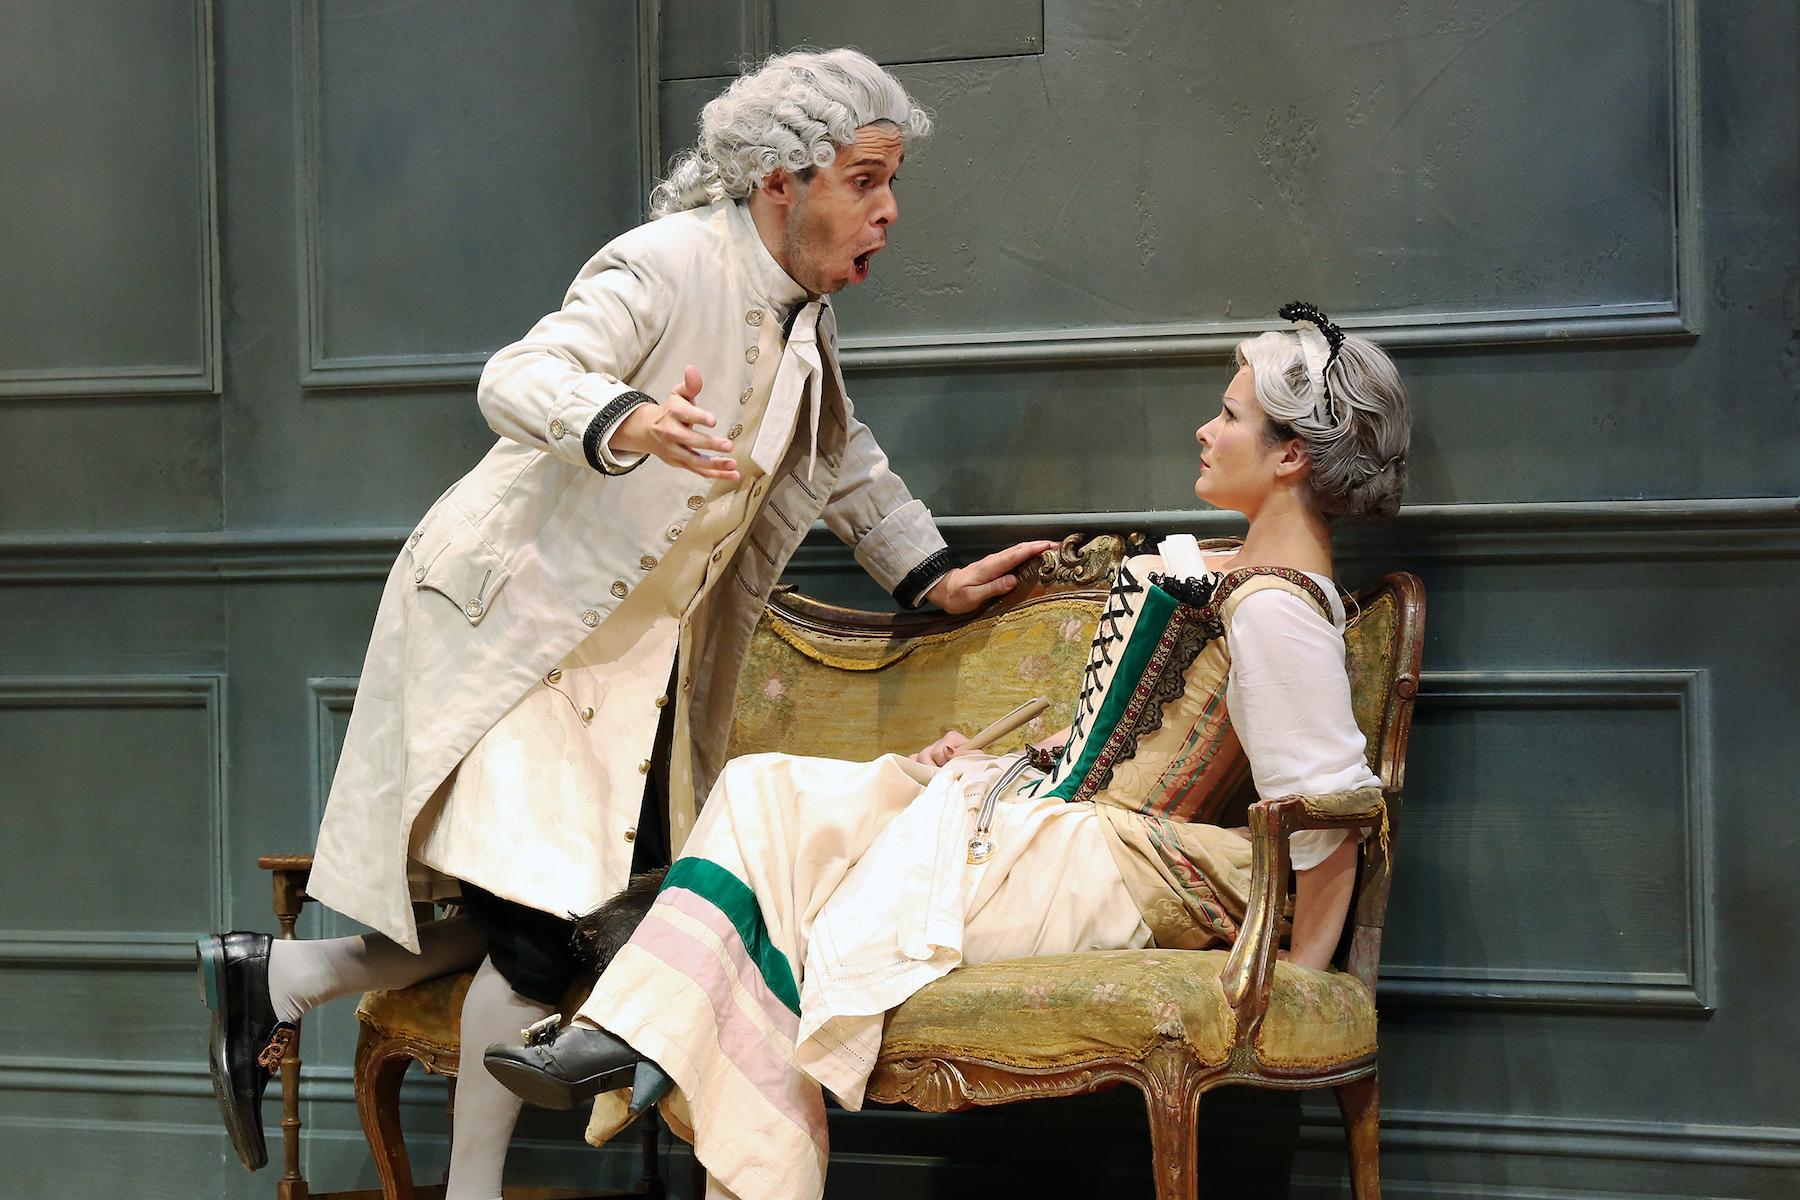 David Greco and Jessica Aszodi in Gretry's L'Amant Jaloux